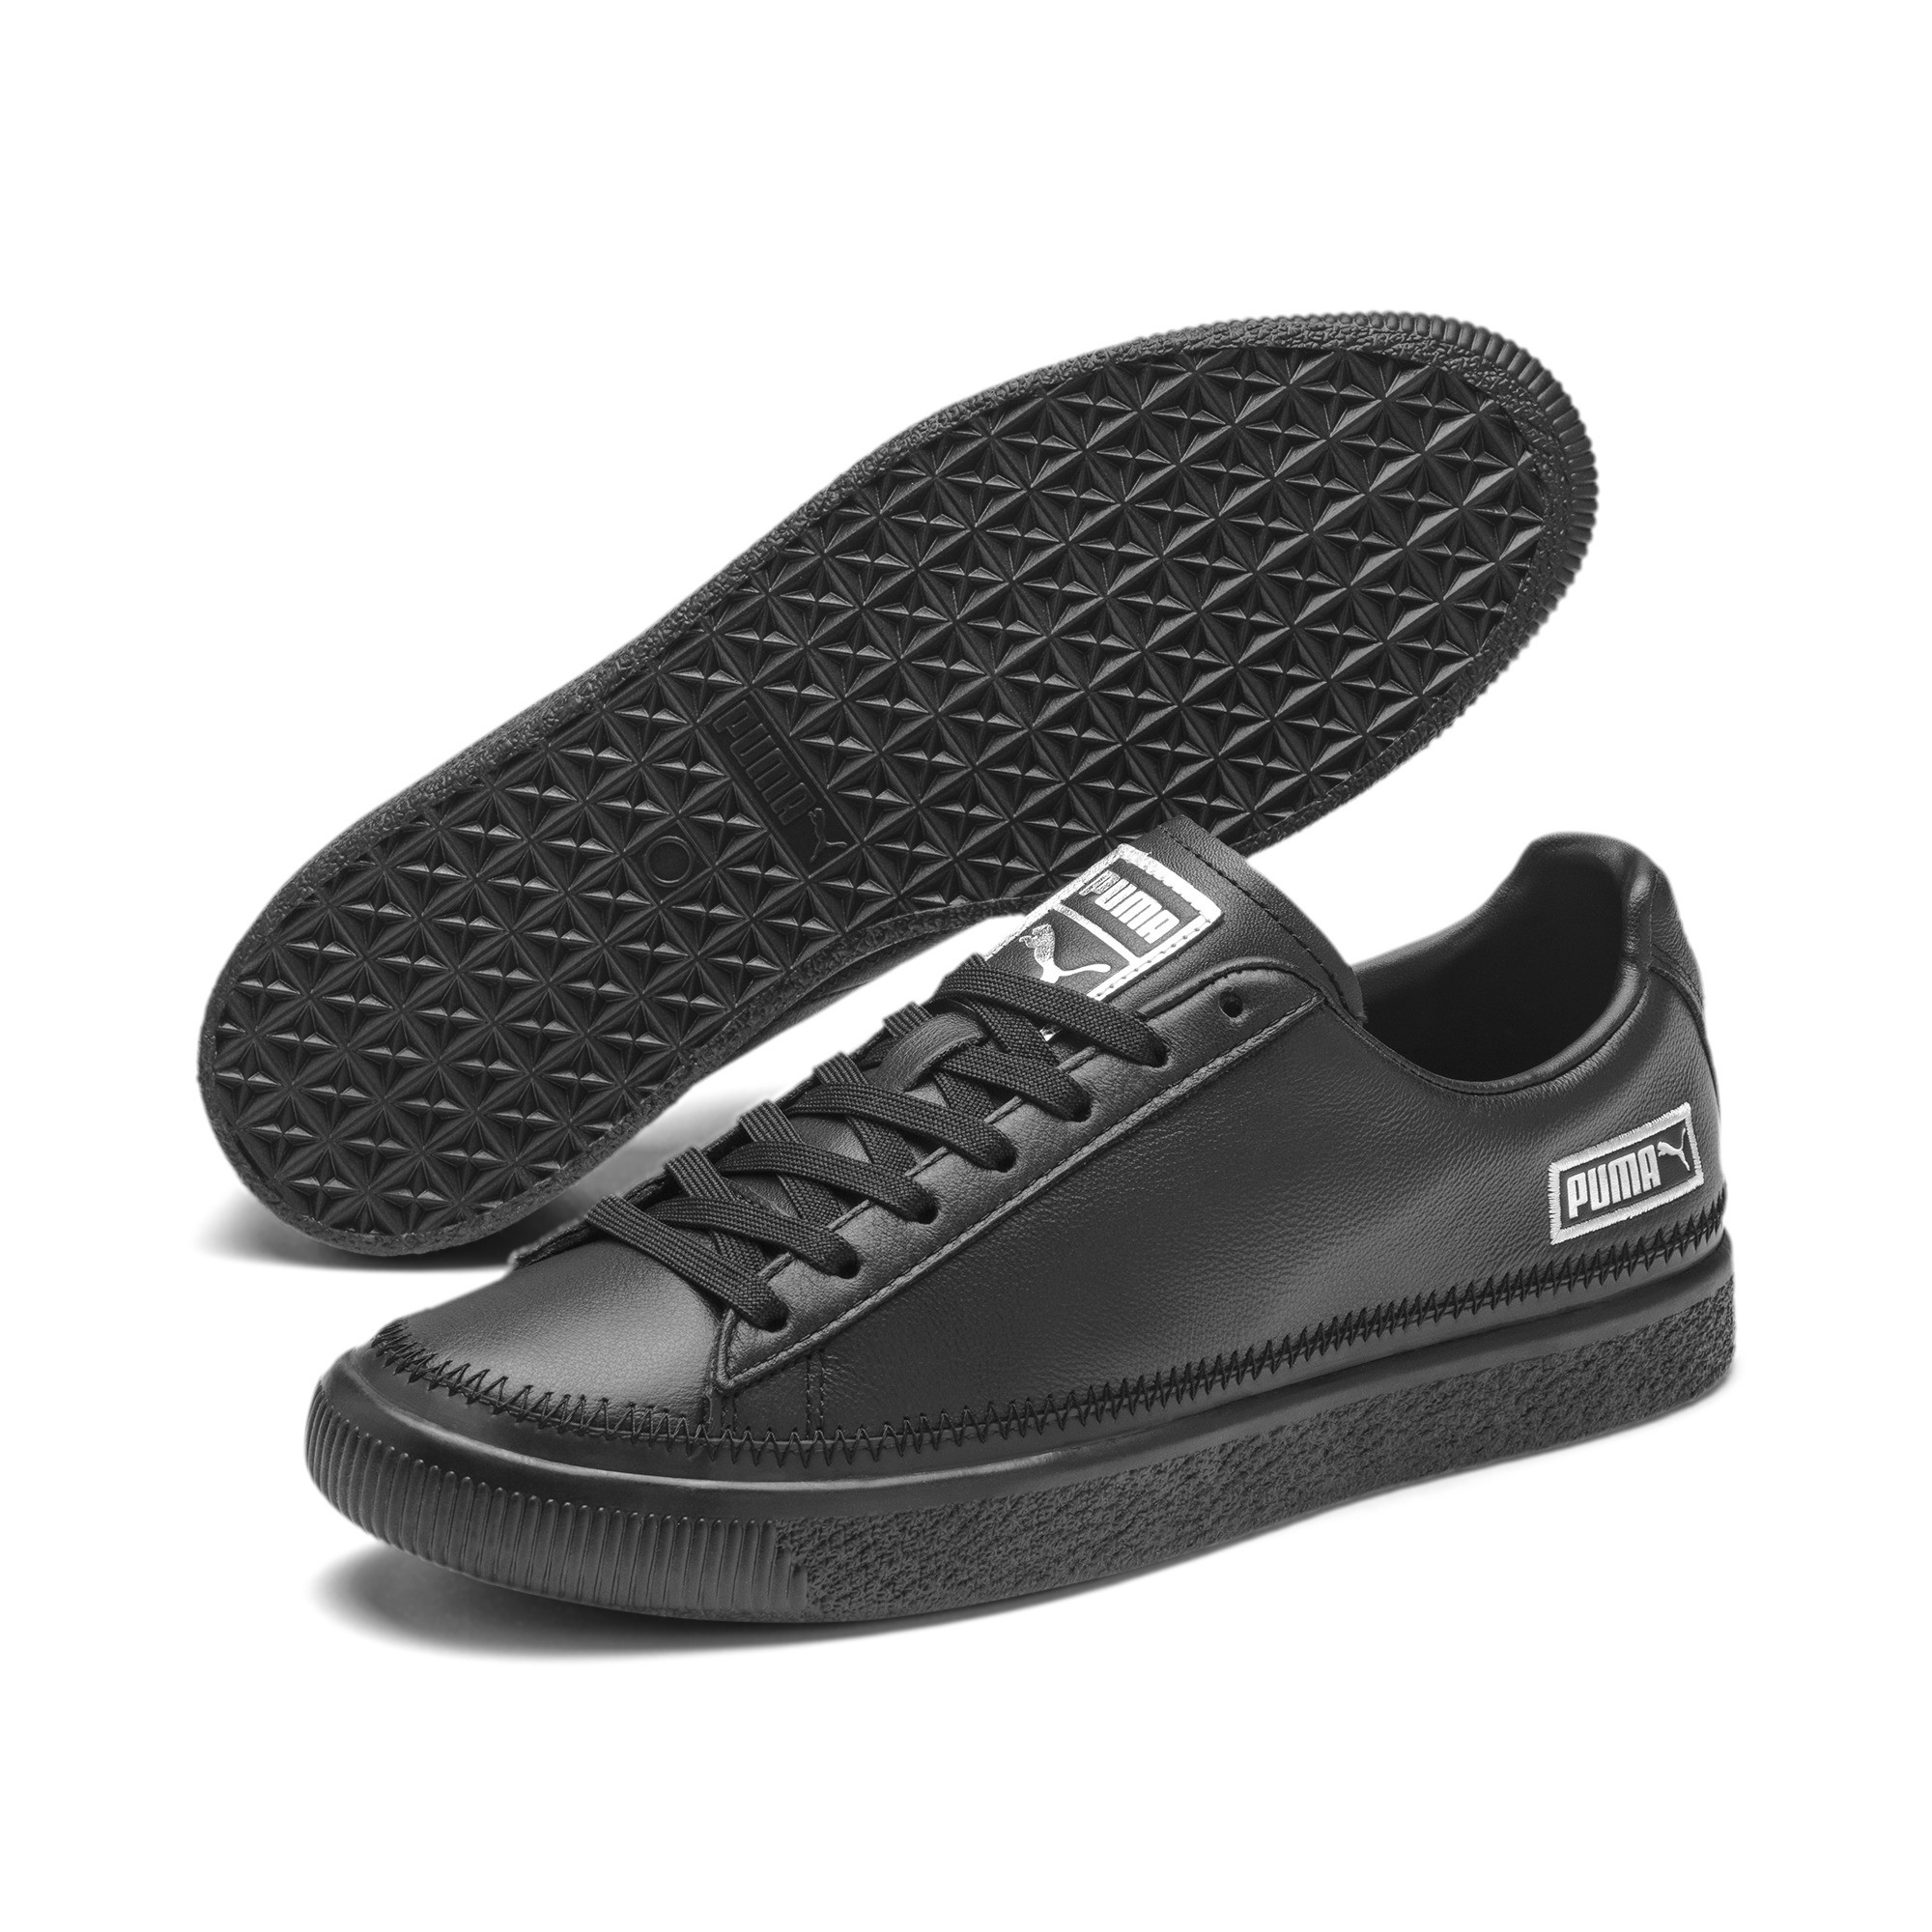 Indexbild 14 - PUMA Basket Stitch Sneaker Unisex Schuhe Neu